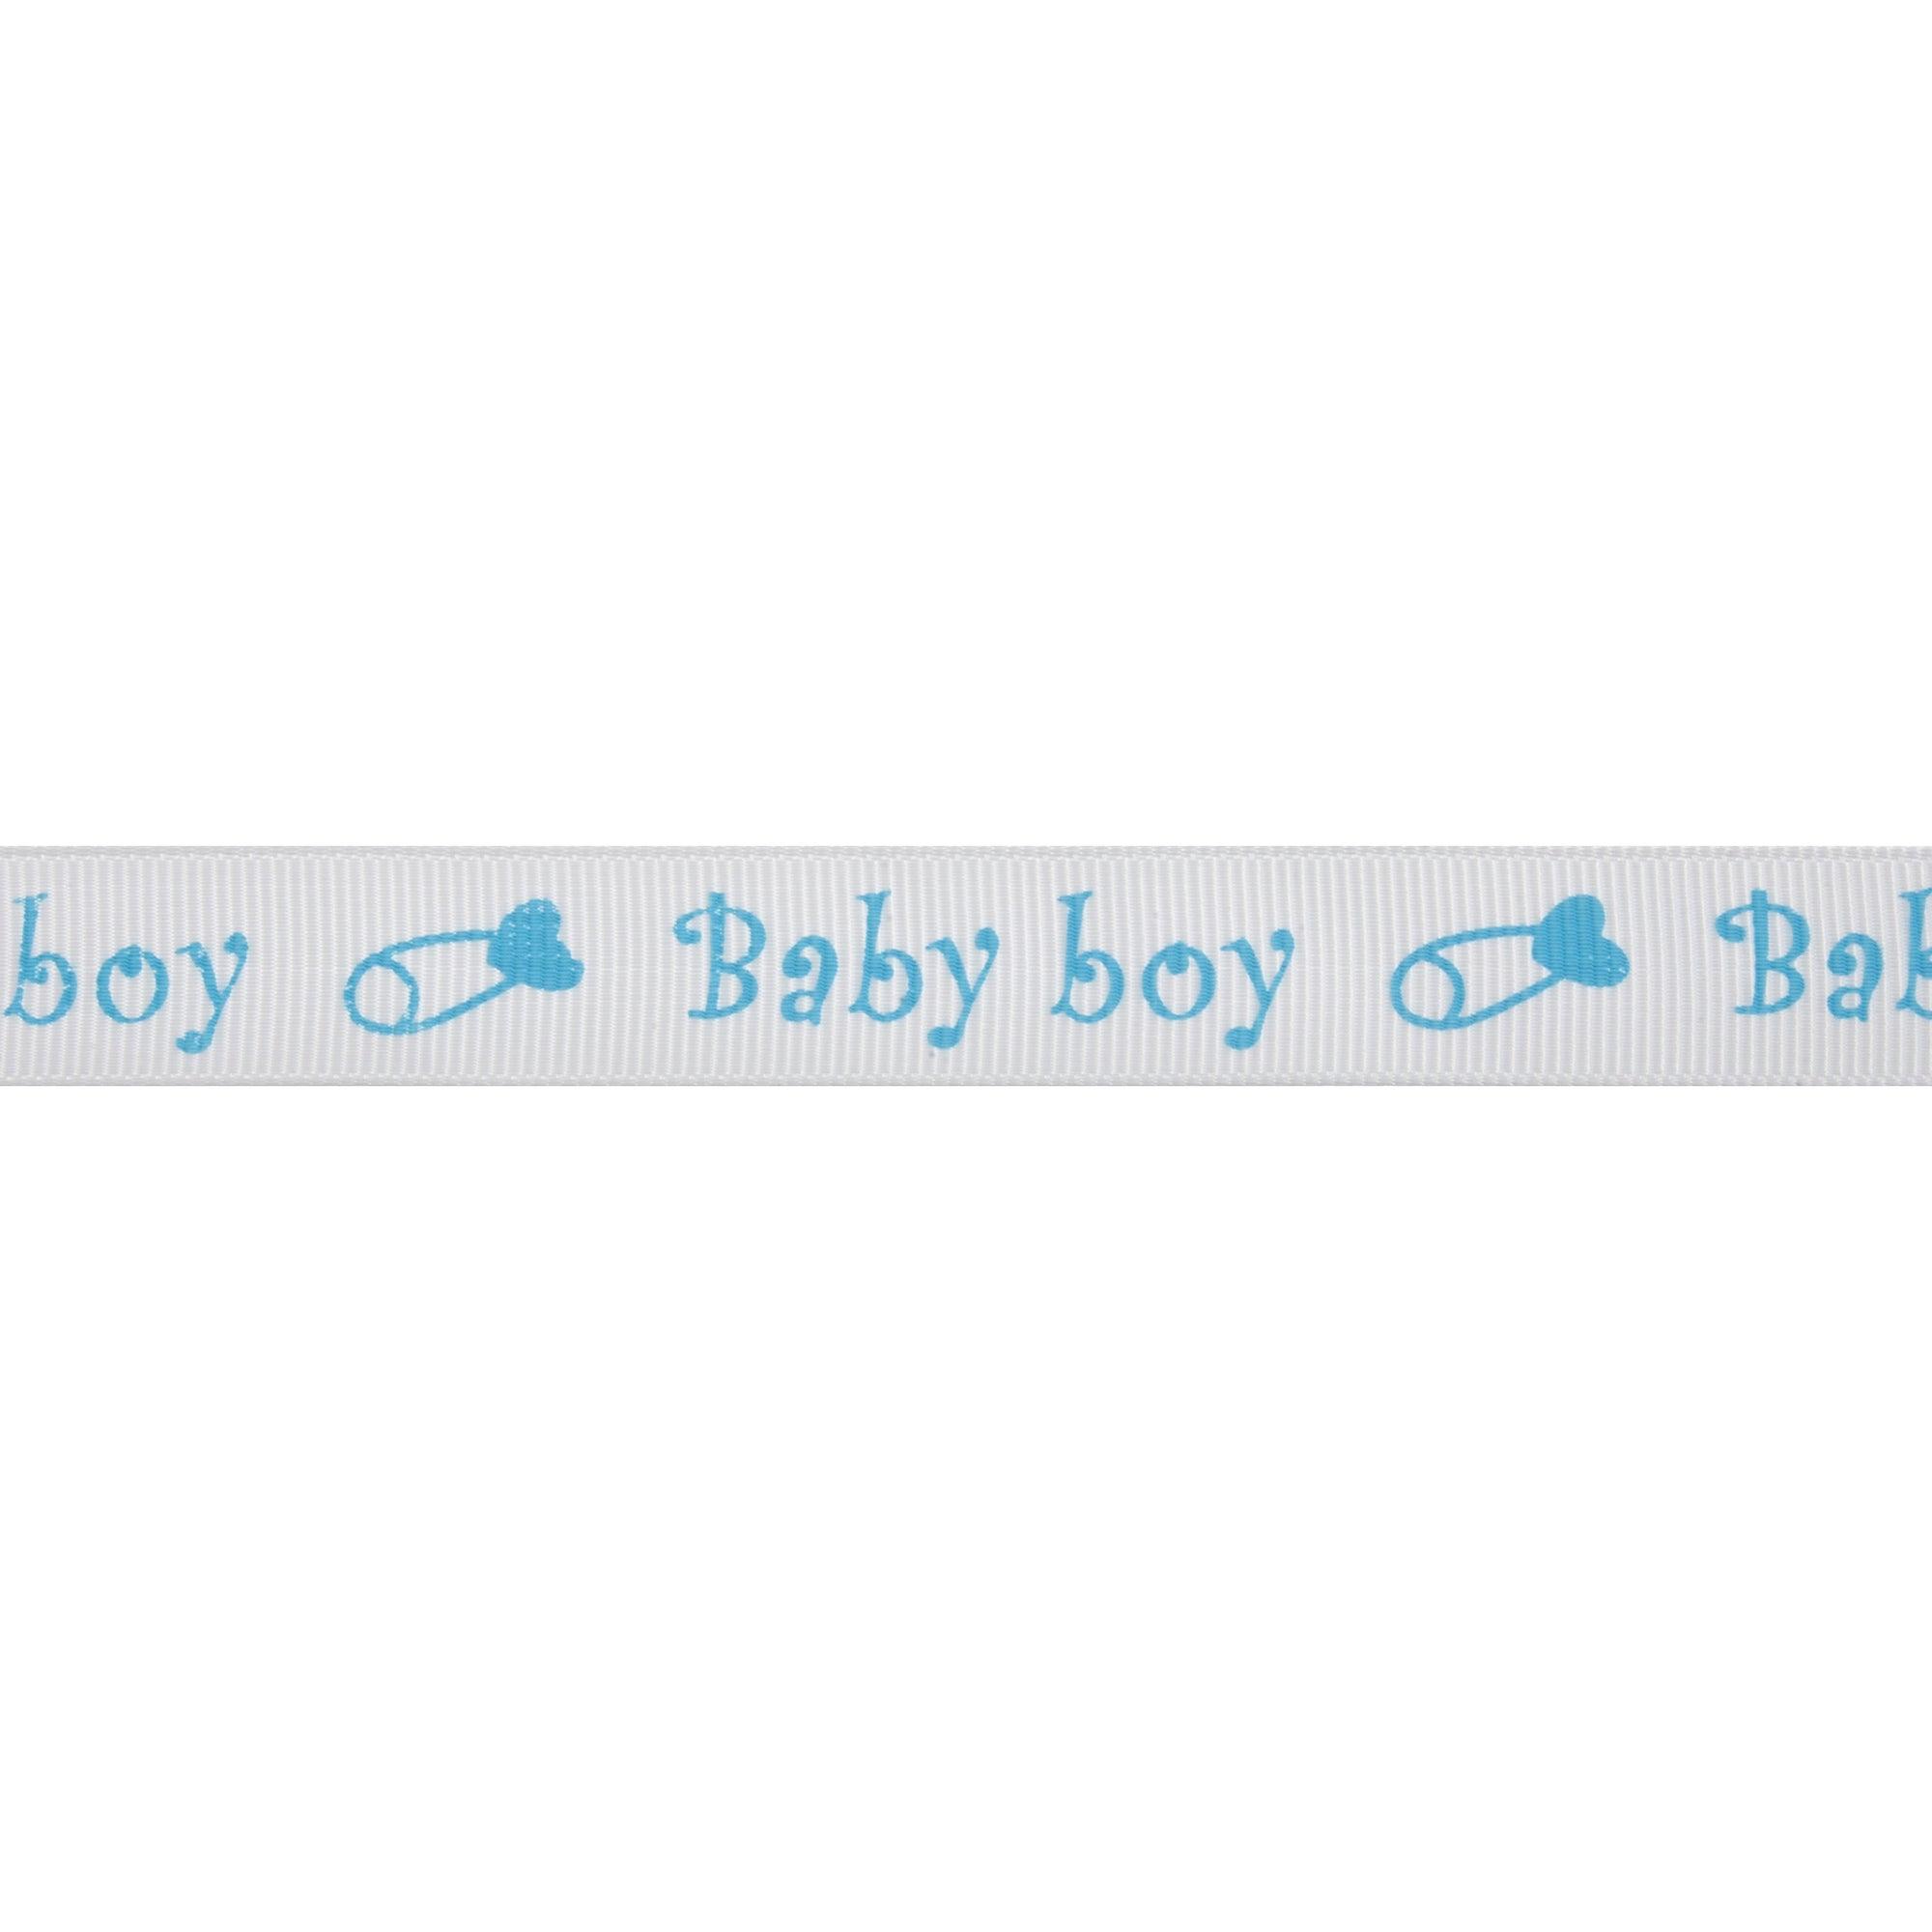 Bowtique Baby Boy Grosgrain Ribbon